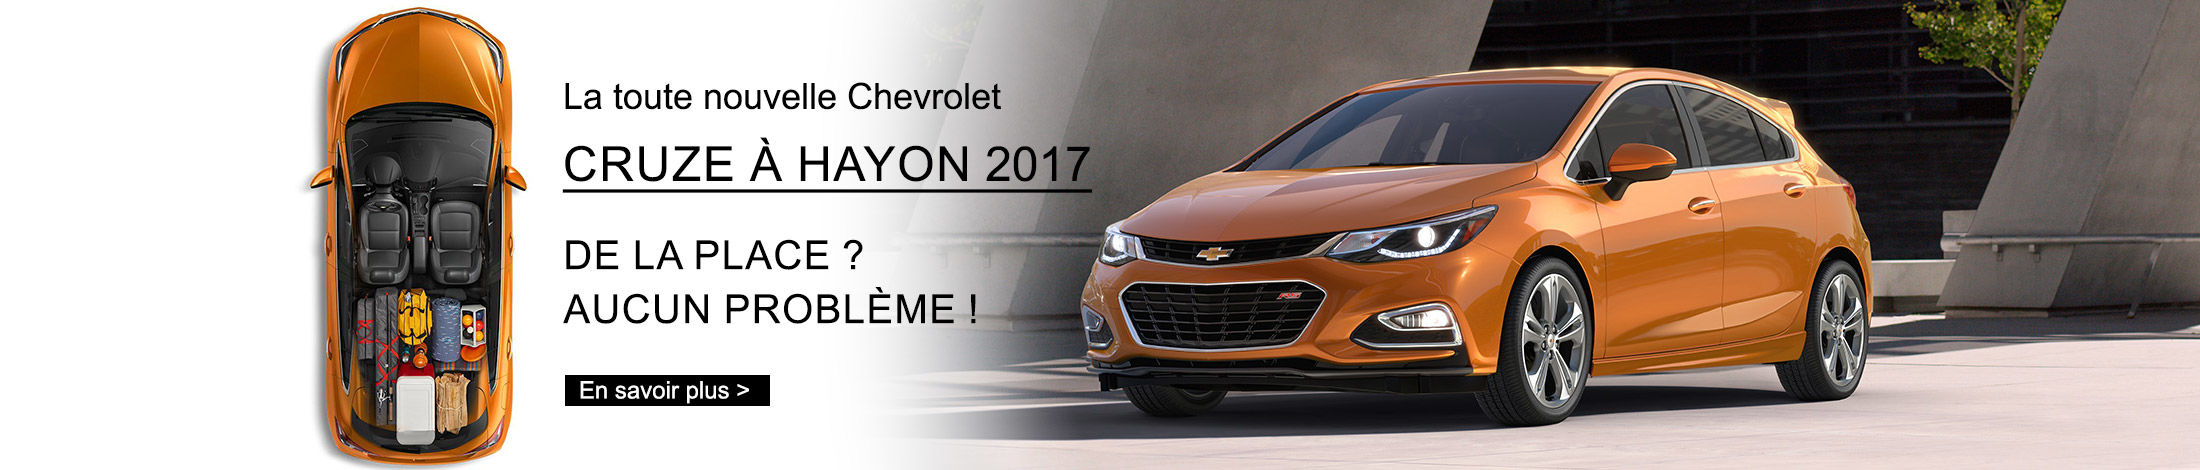 Header Chevrolet Cruze 2017